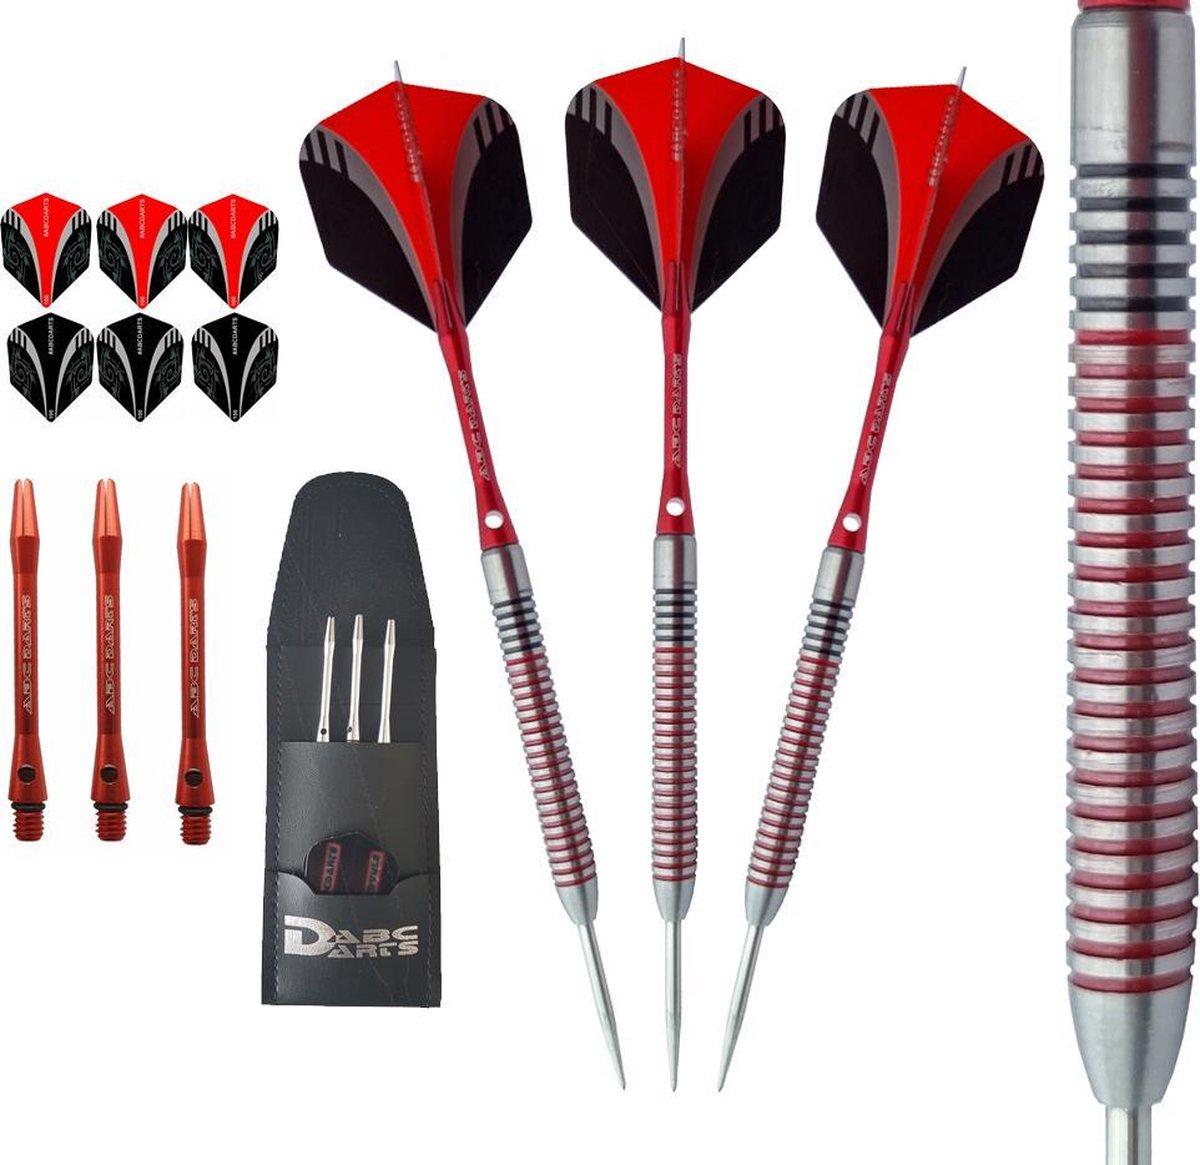 ABC Darts Professionele Dartpijlen - Red Dragonas Multi Ring - 28 gram